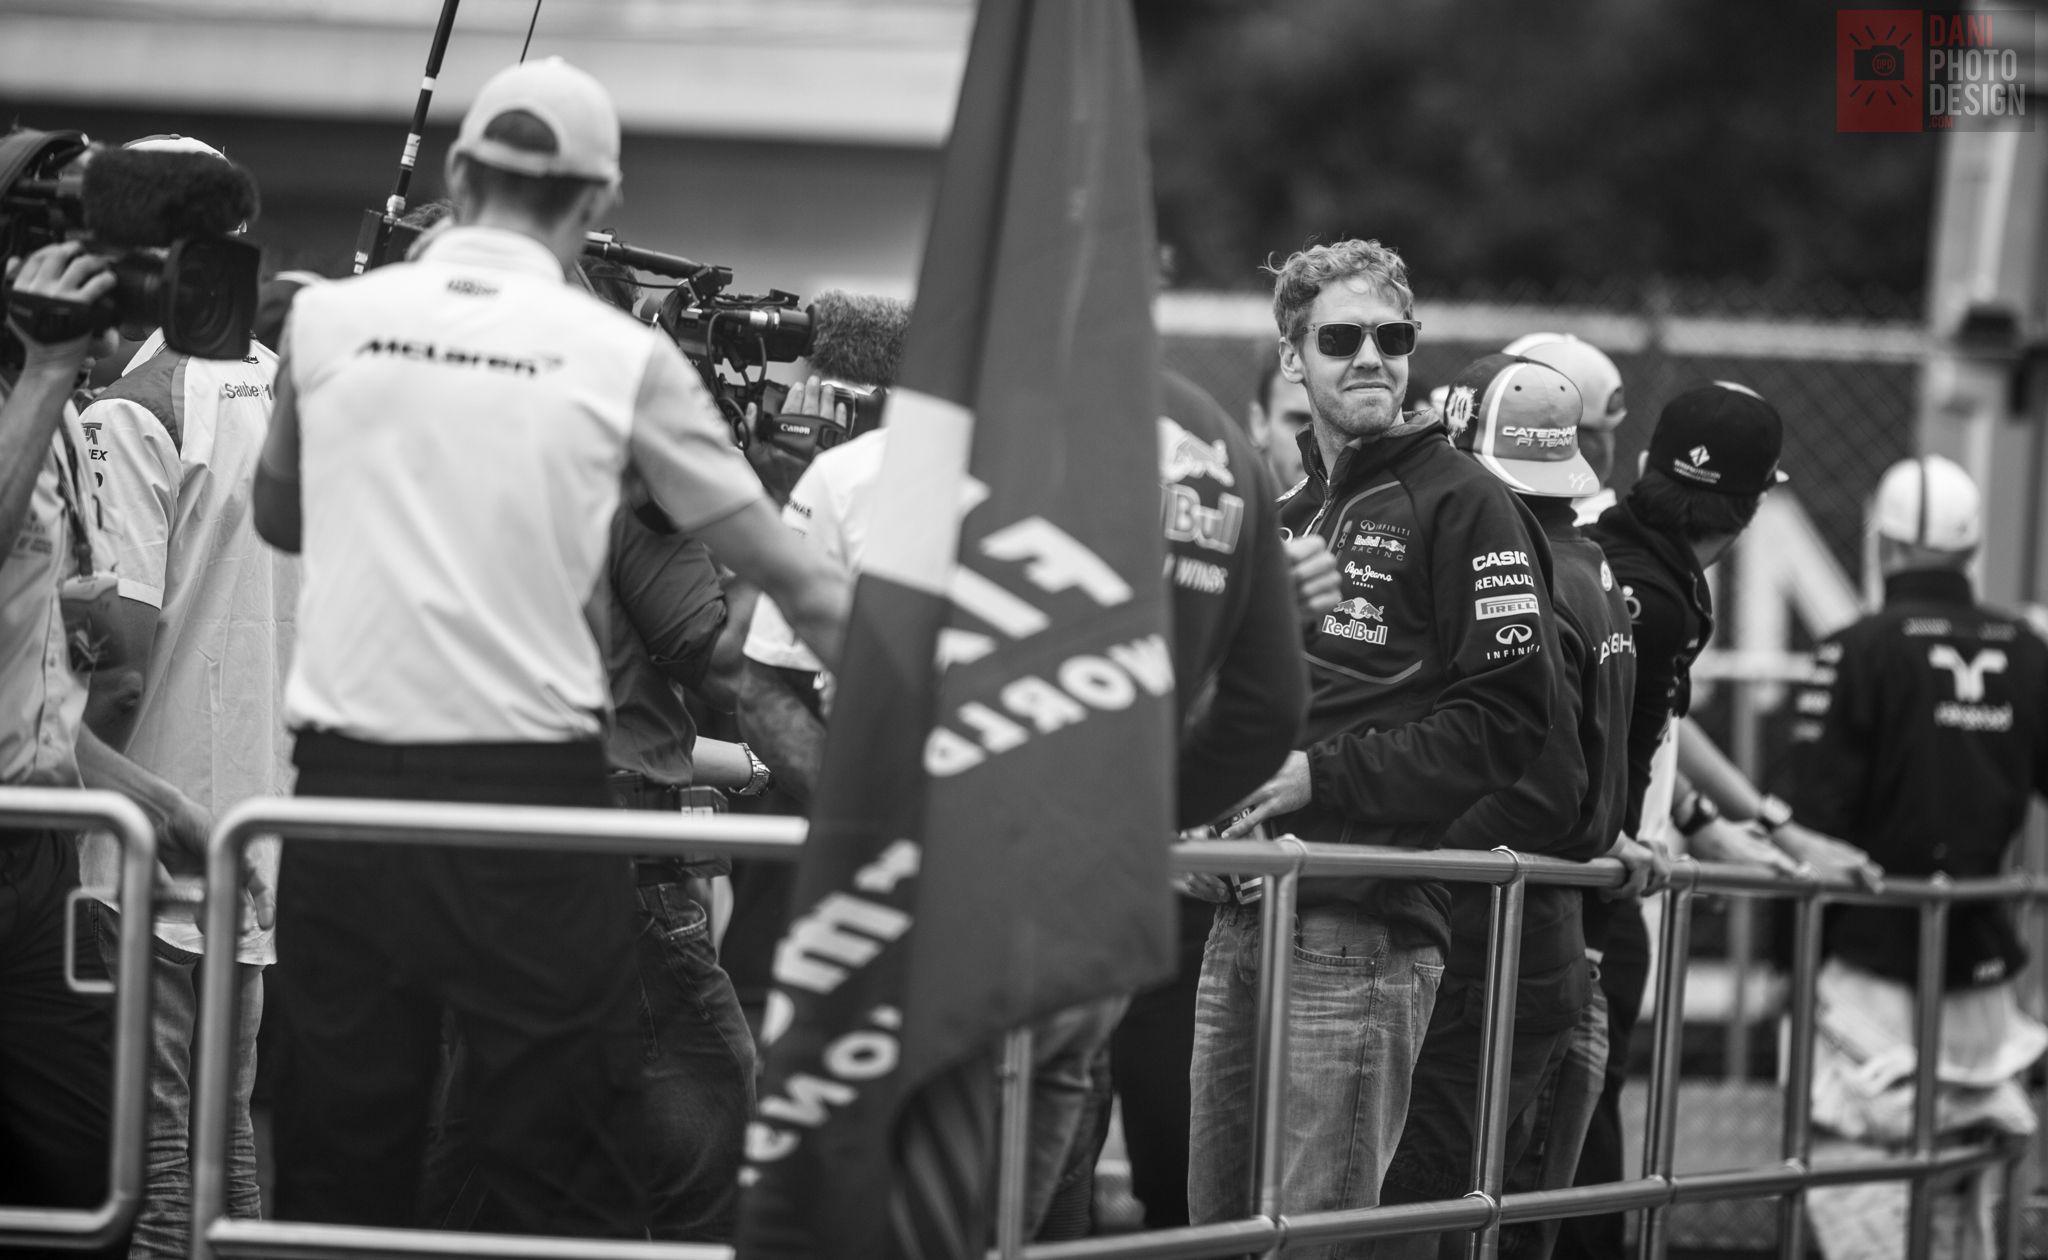 Formula 1 - Sebastian Vettel - GP Monaco Montecarlo 2014 - daniphotodesign.com